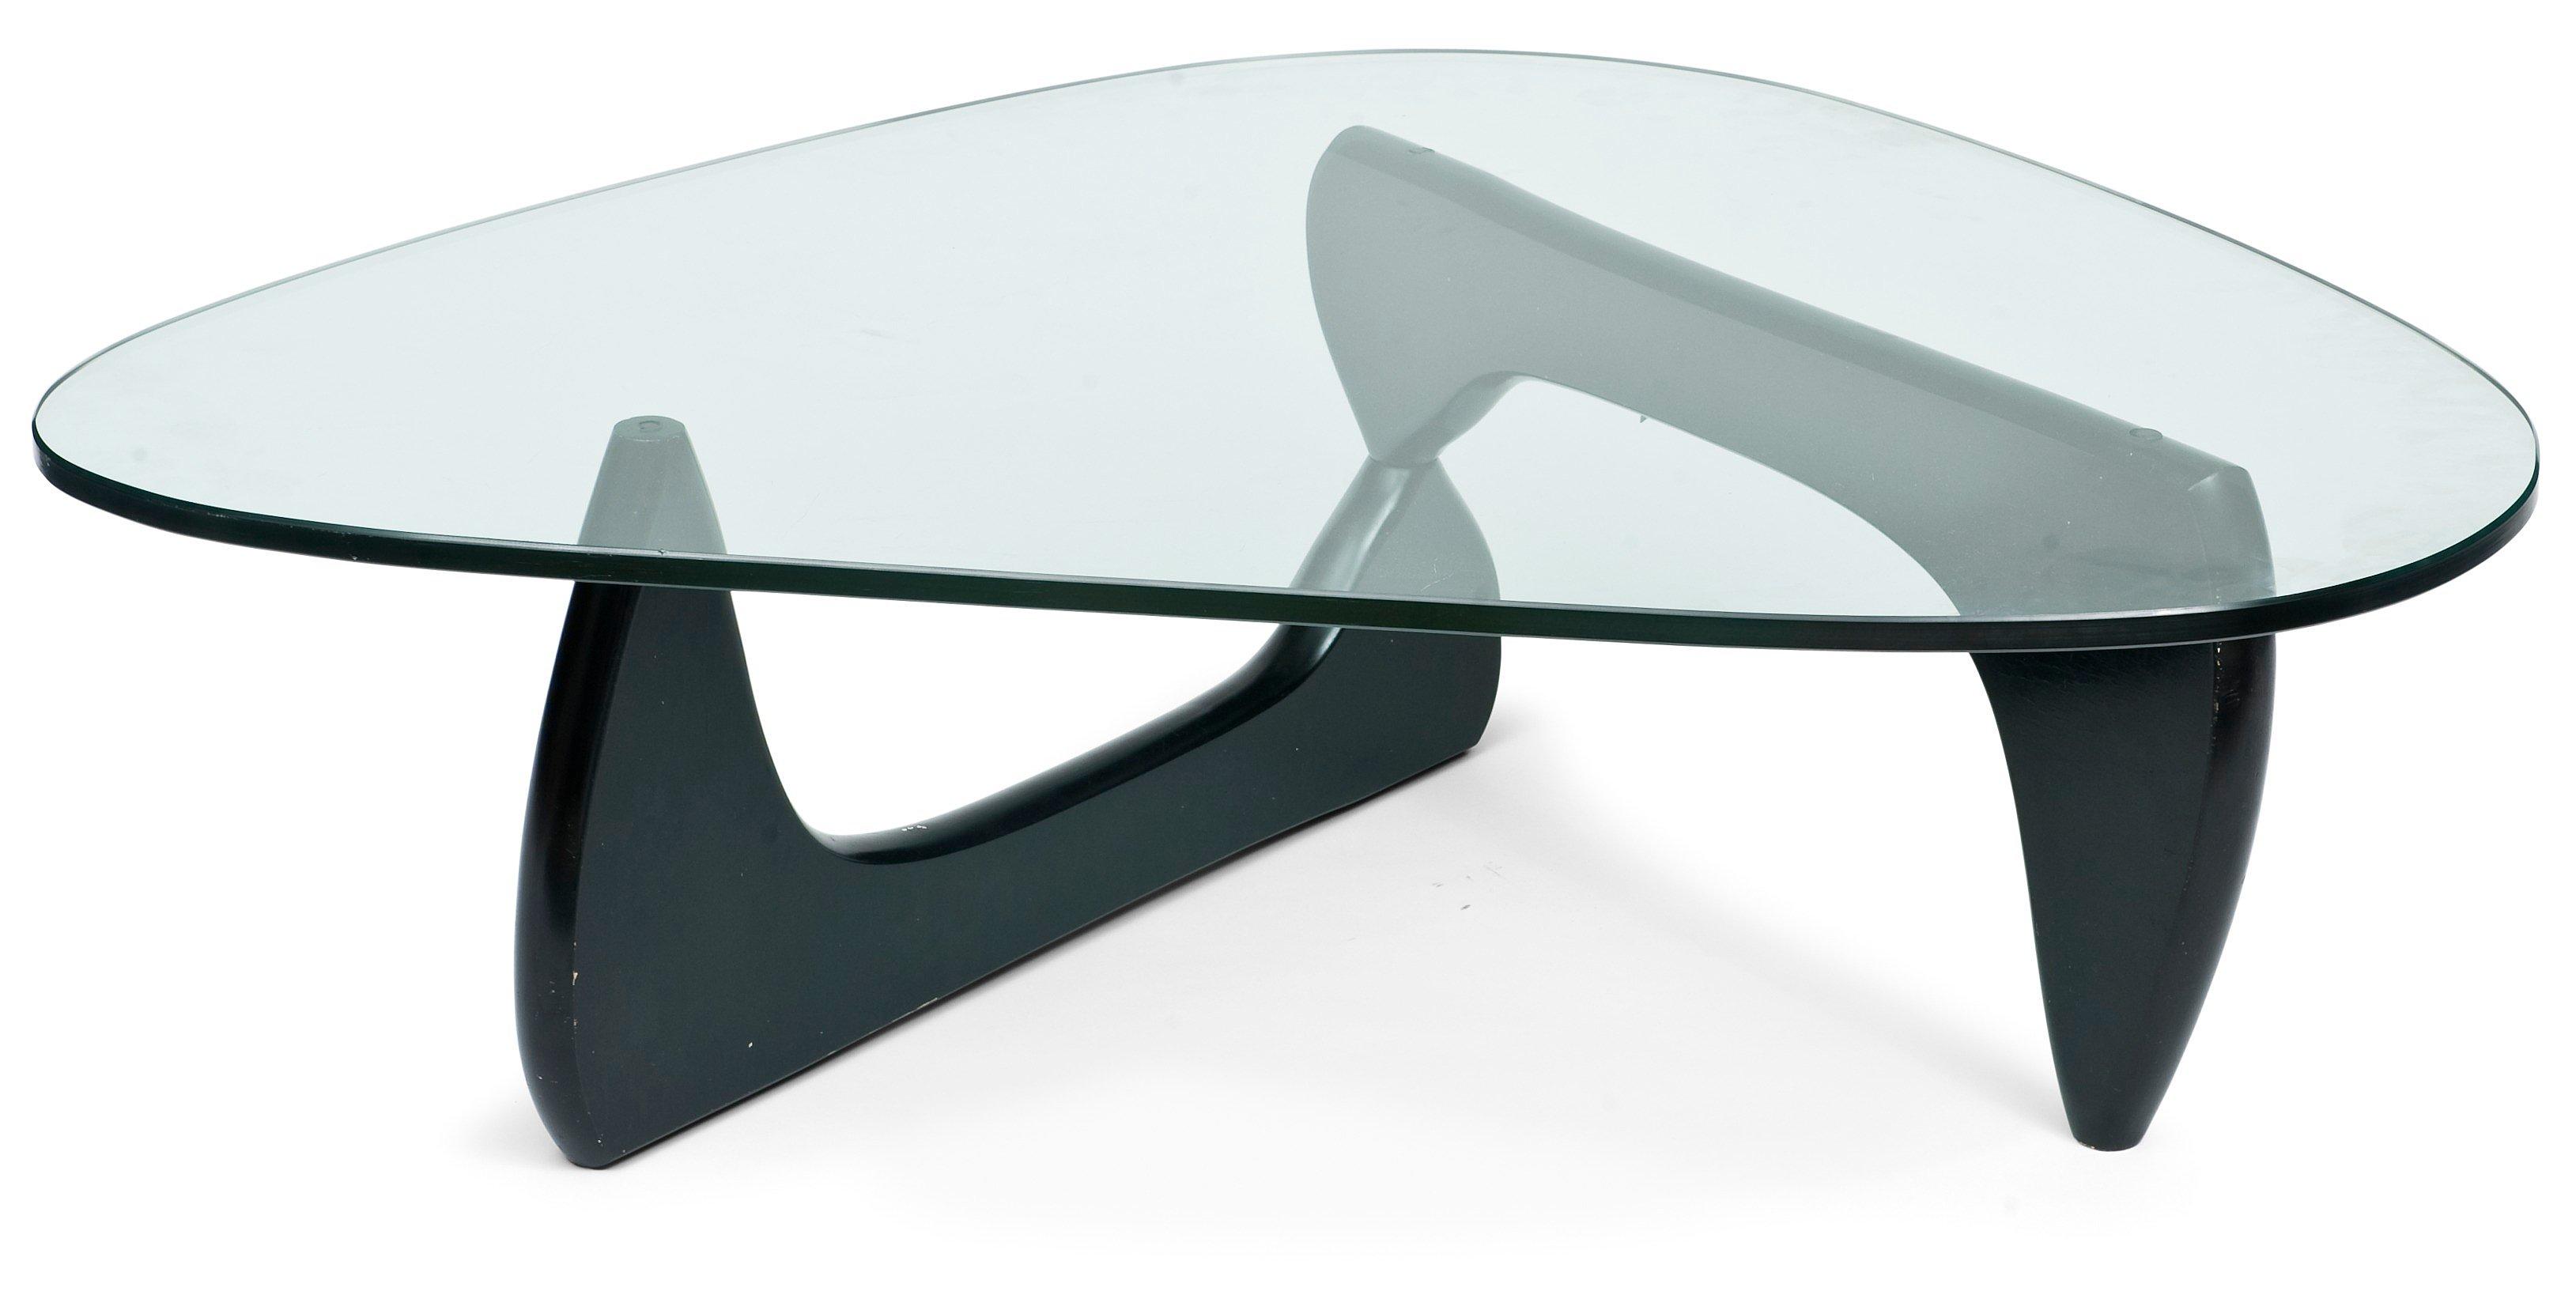 Beau An Isamu Noguchi Sofa Table, U0027IM 50u0027 By Herman Miller, 1970u0027s.   Bukowskis